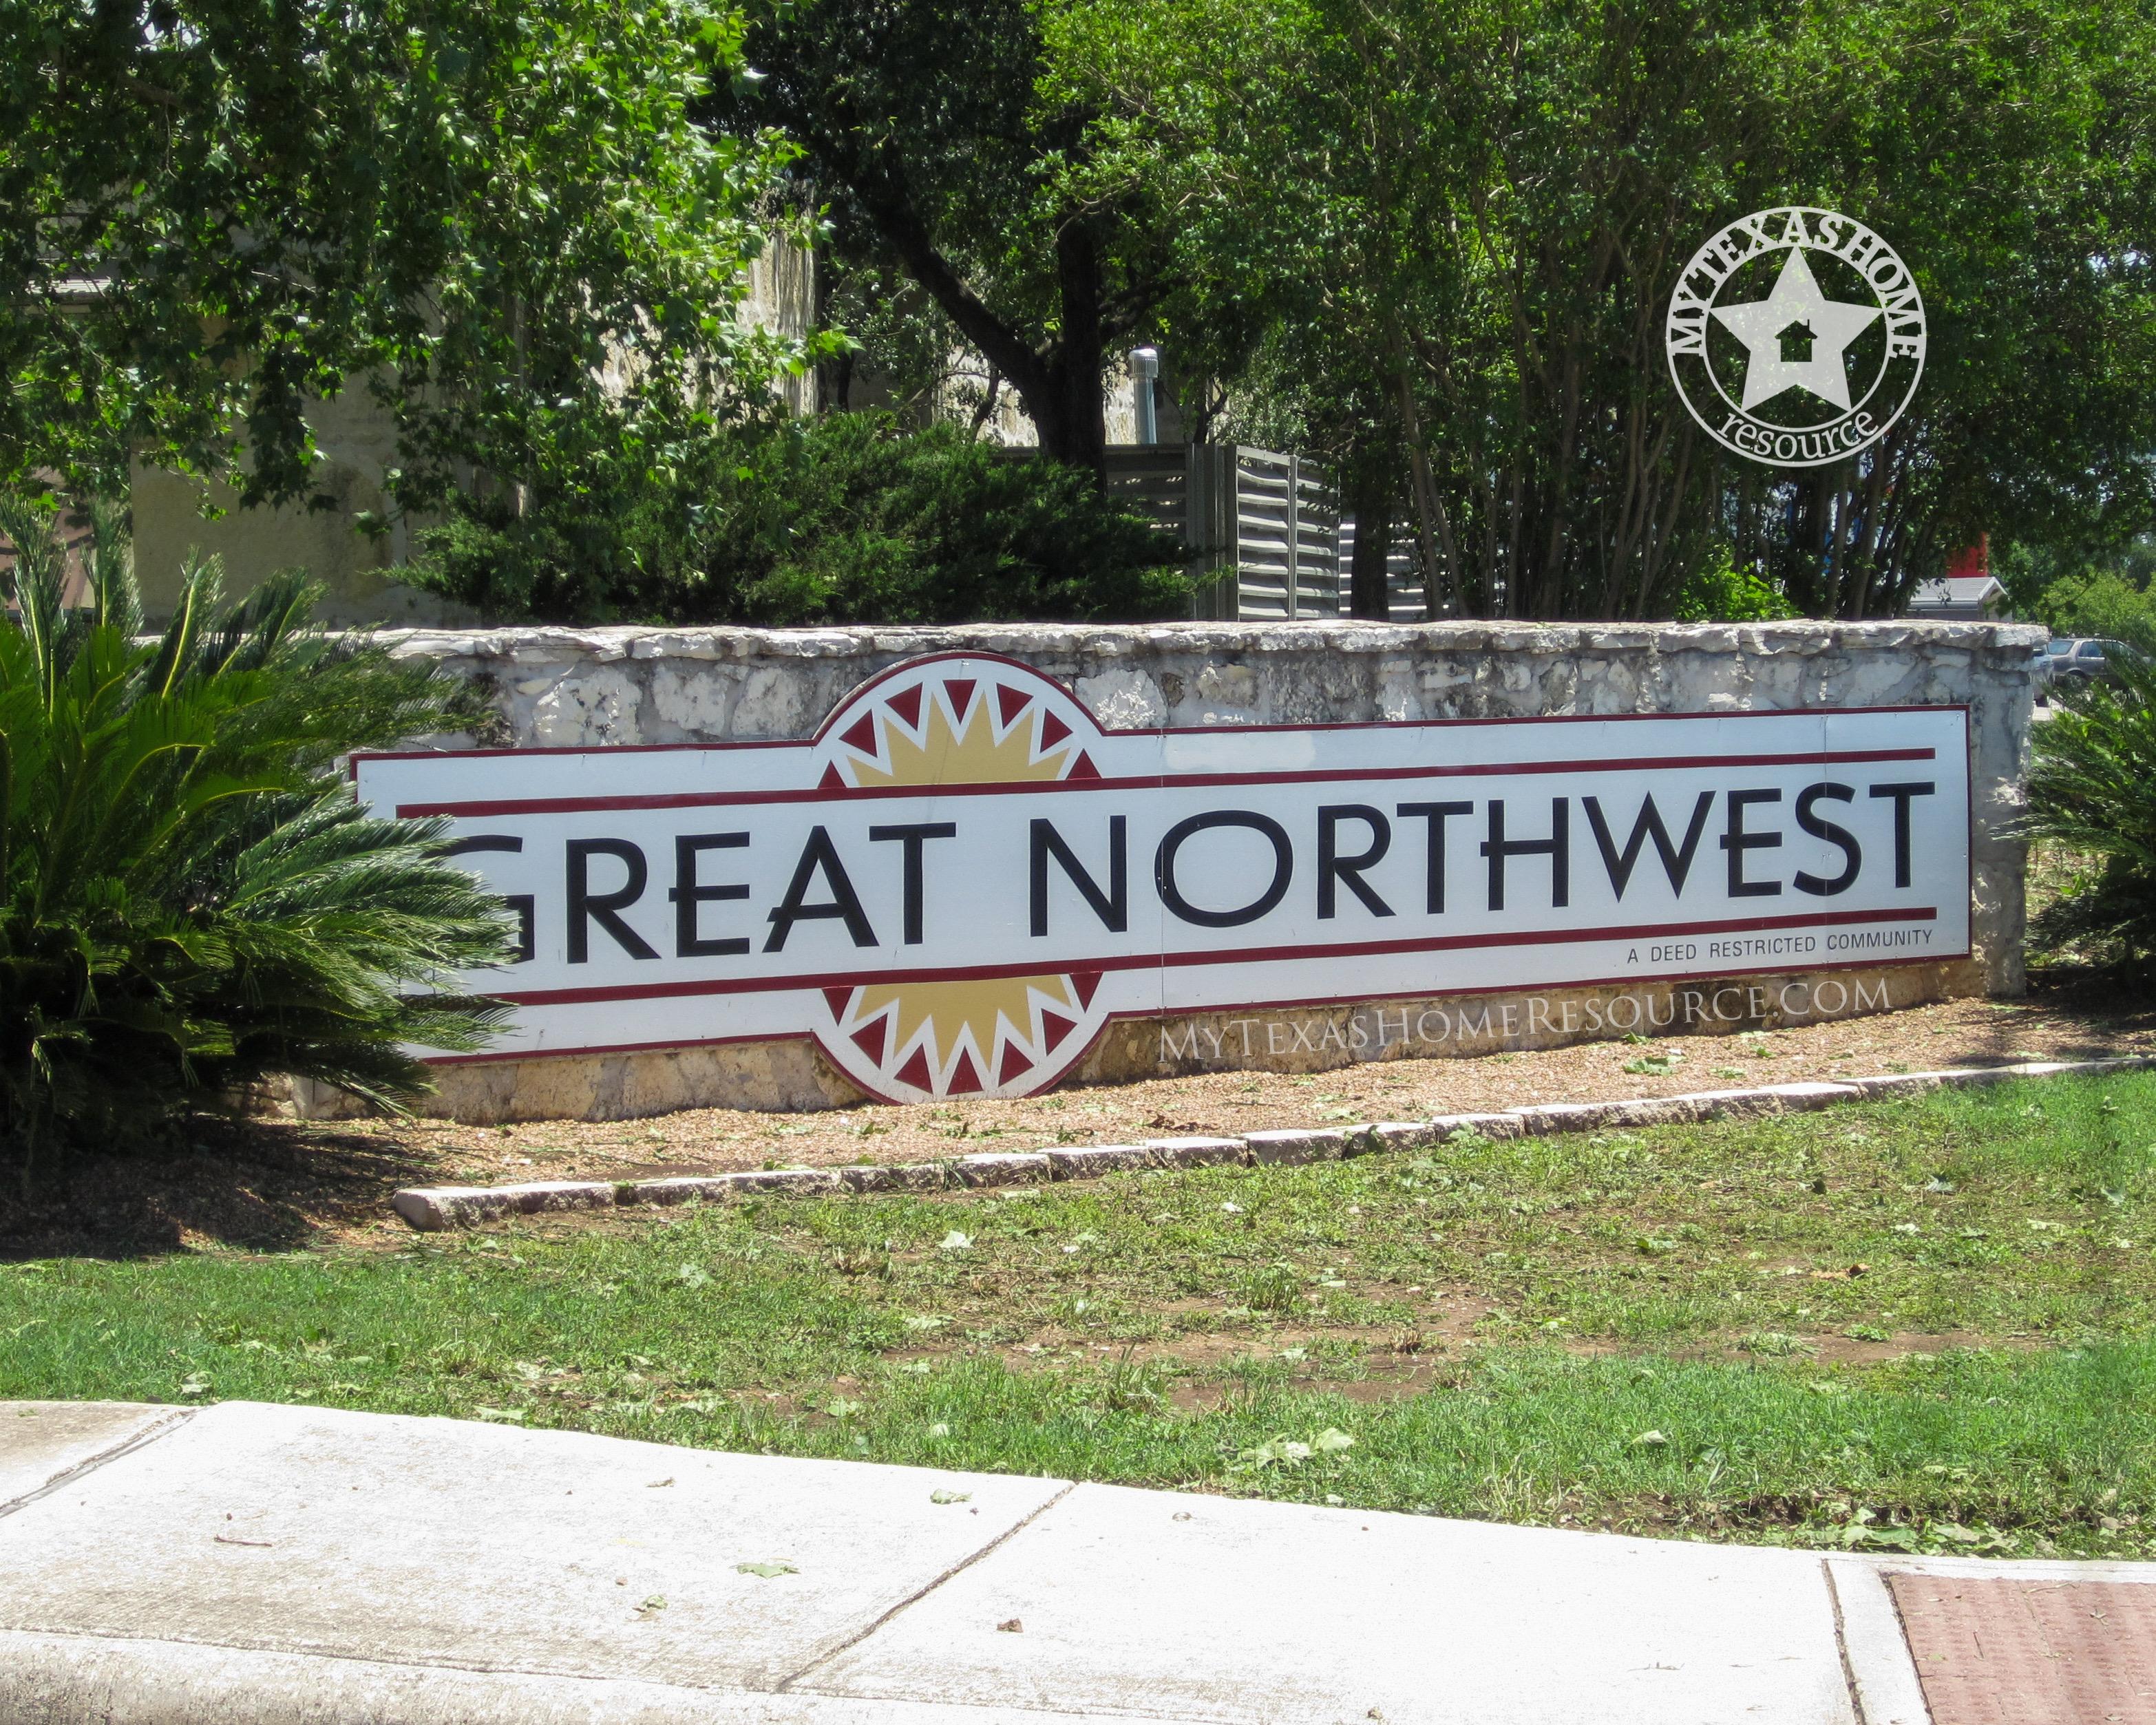 Great Northwest Community San Antonio, TX